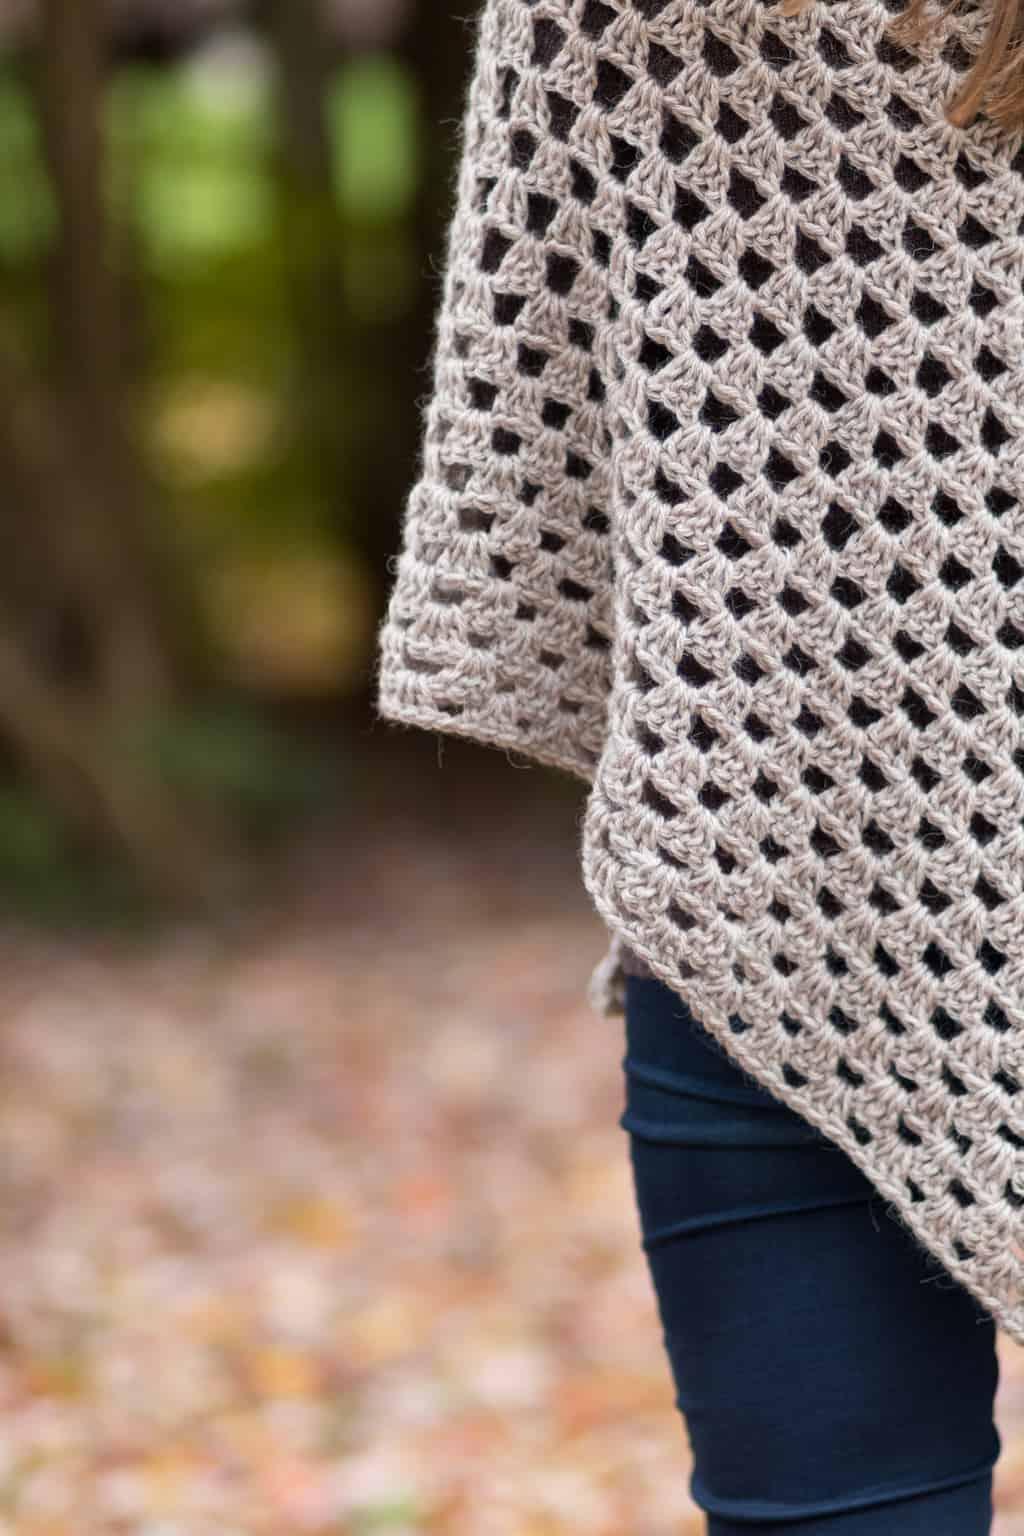 Stitch Detail of a Granny Crochet Shawl Pattern